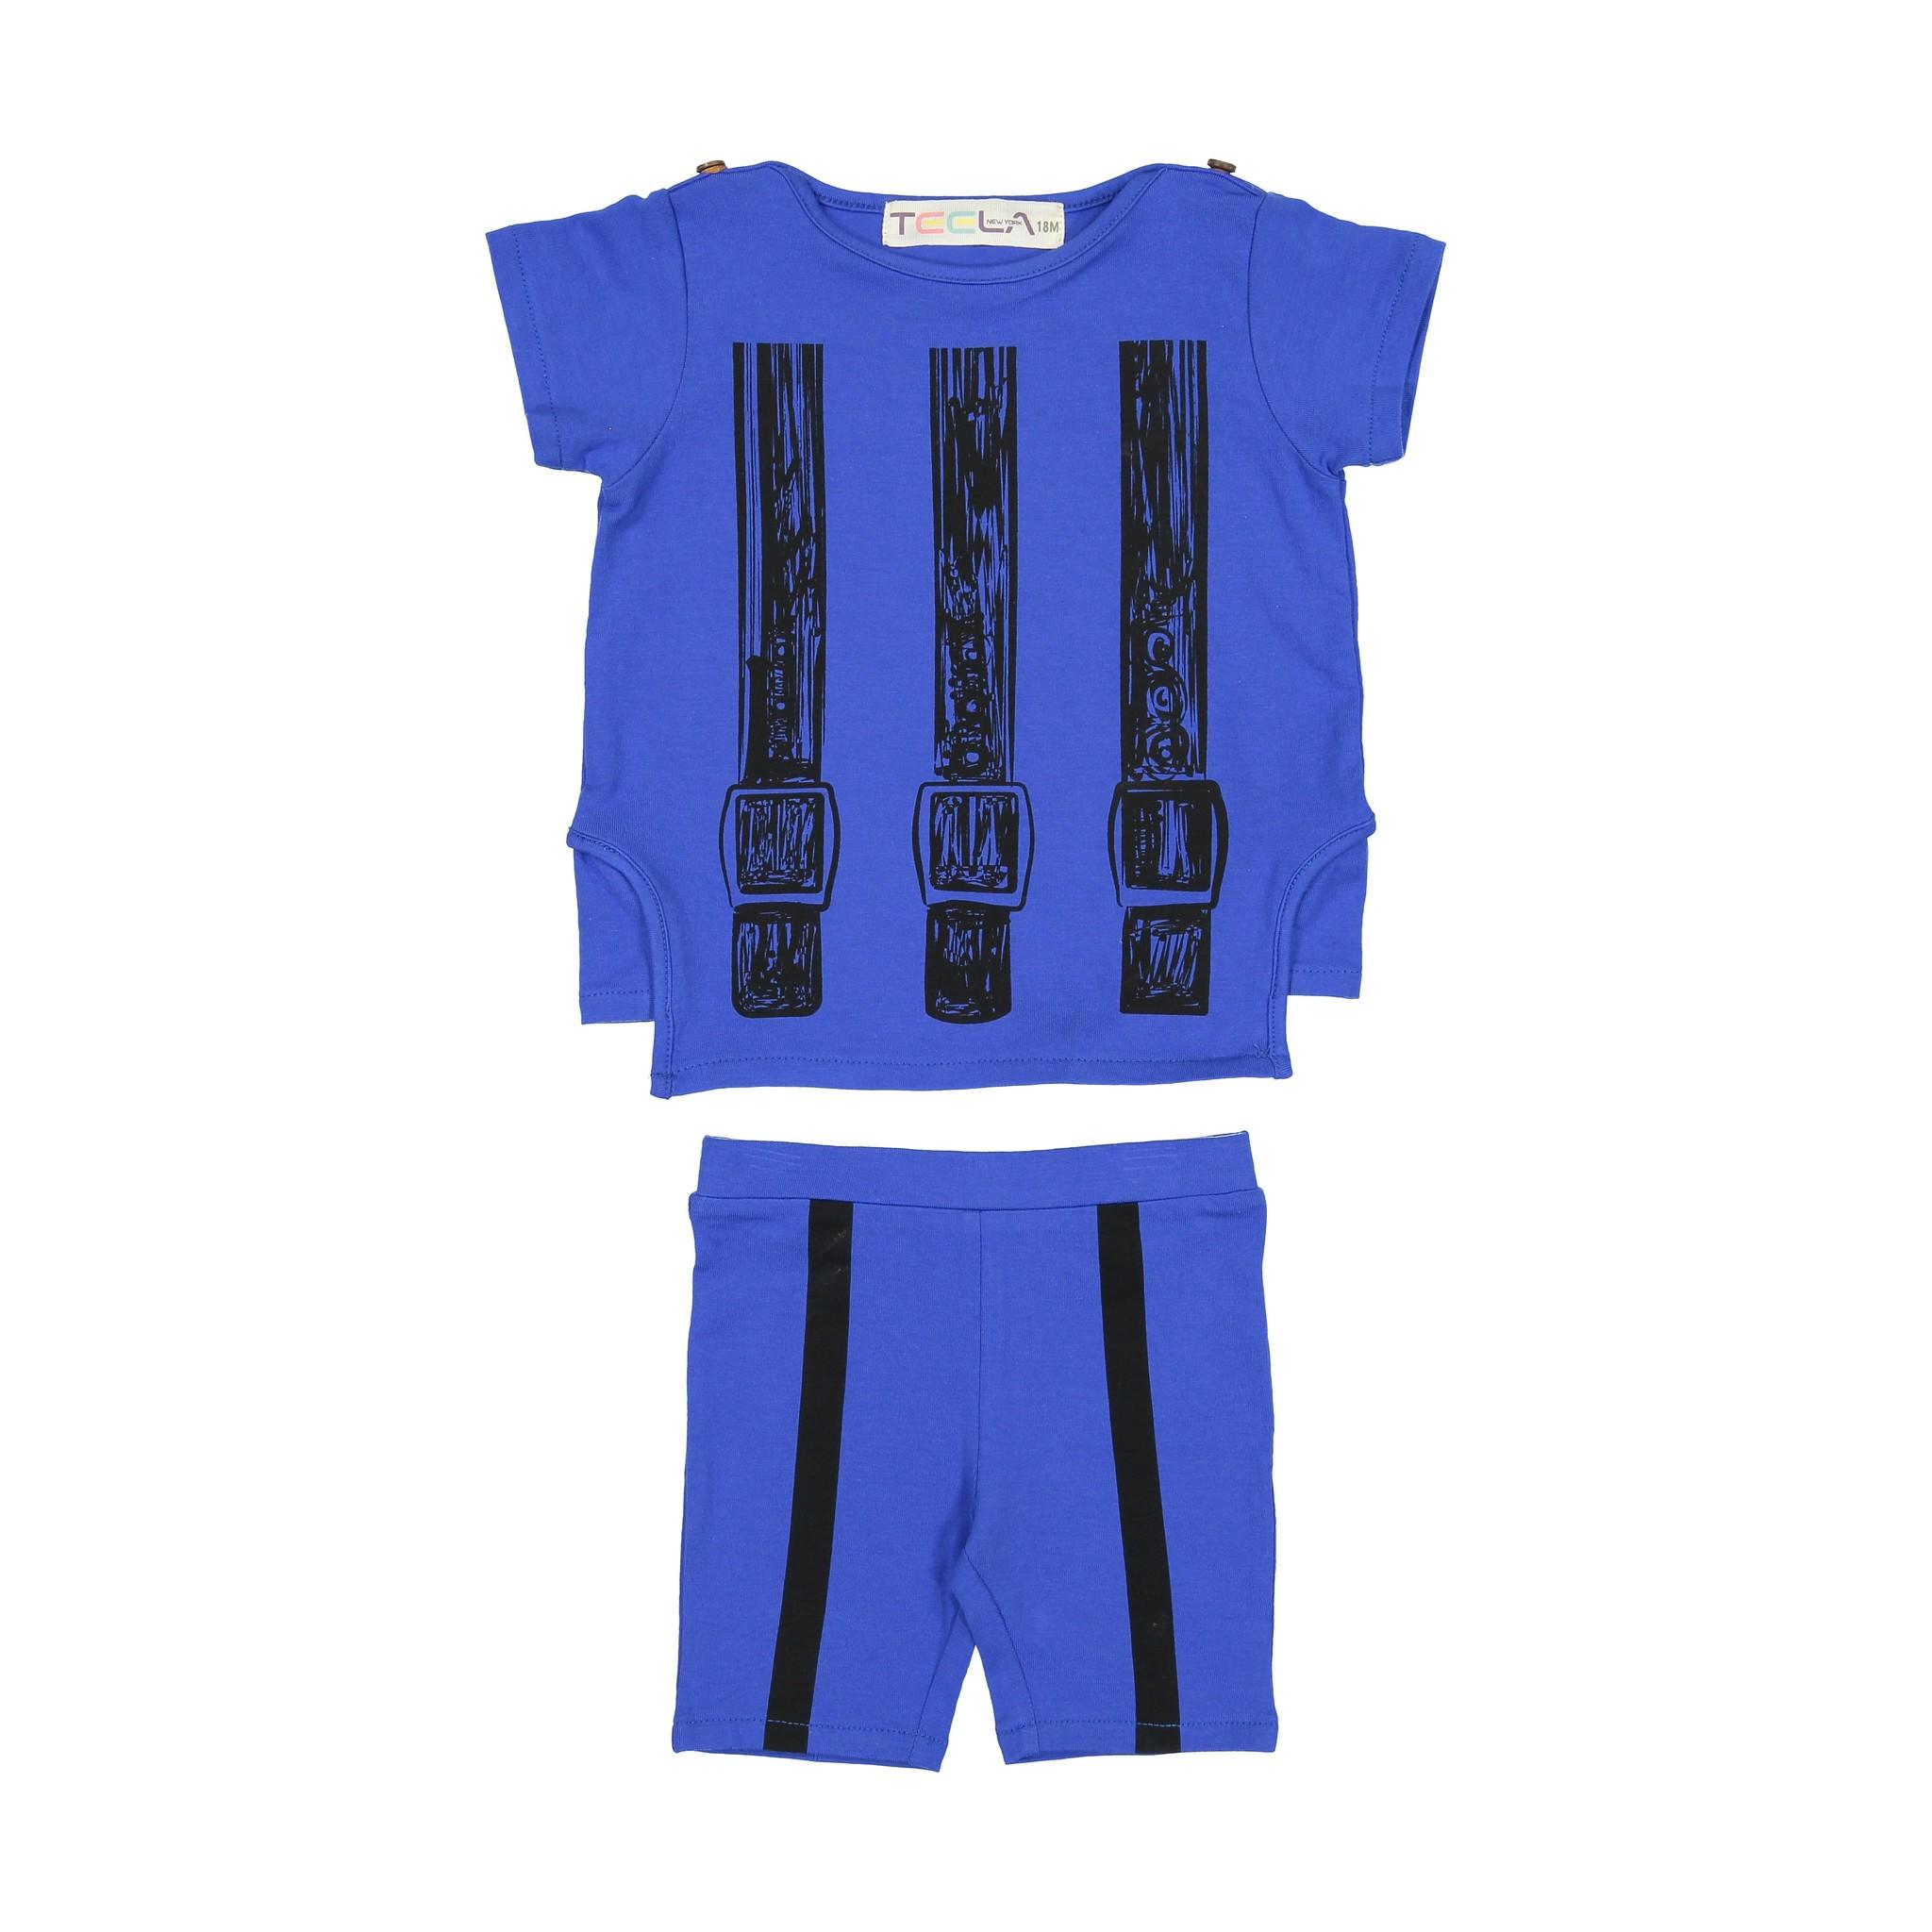 Teela BELT Baby Set Dazzling Blue